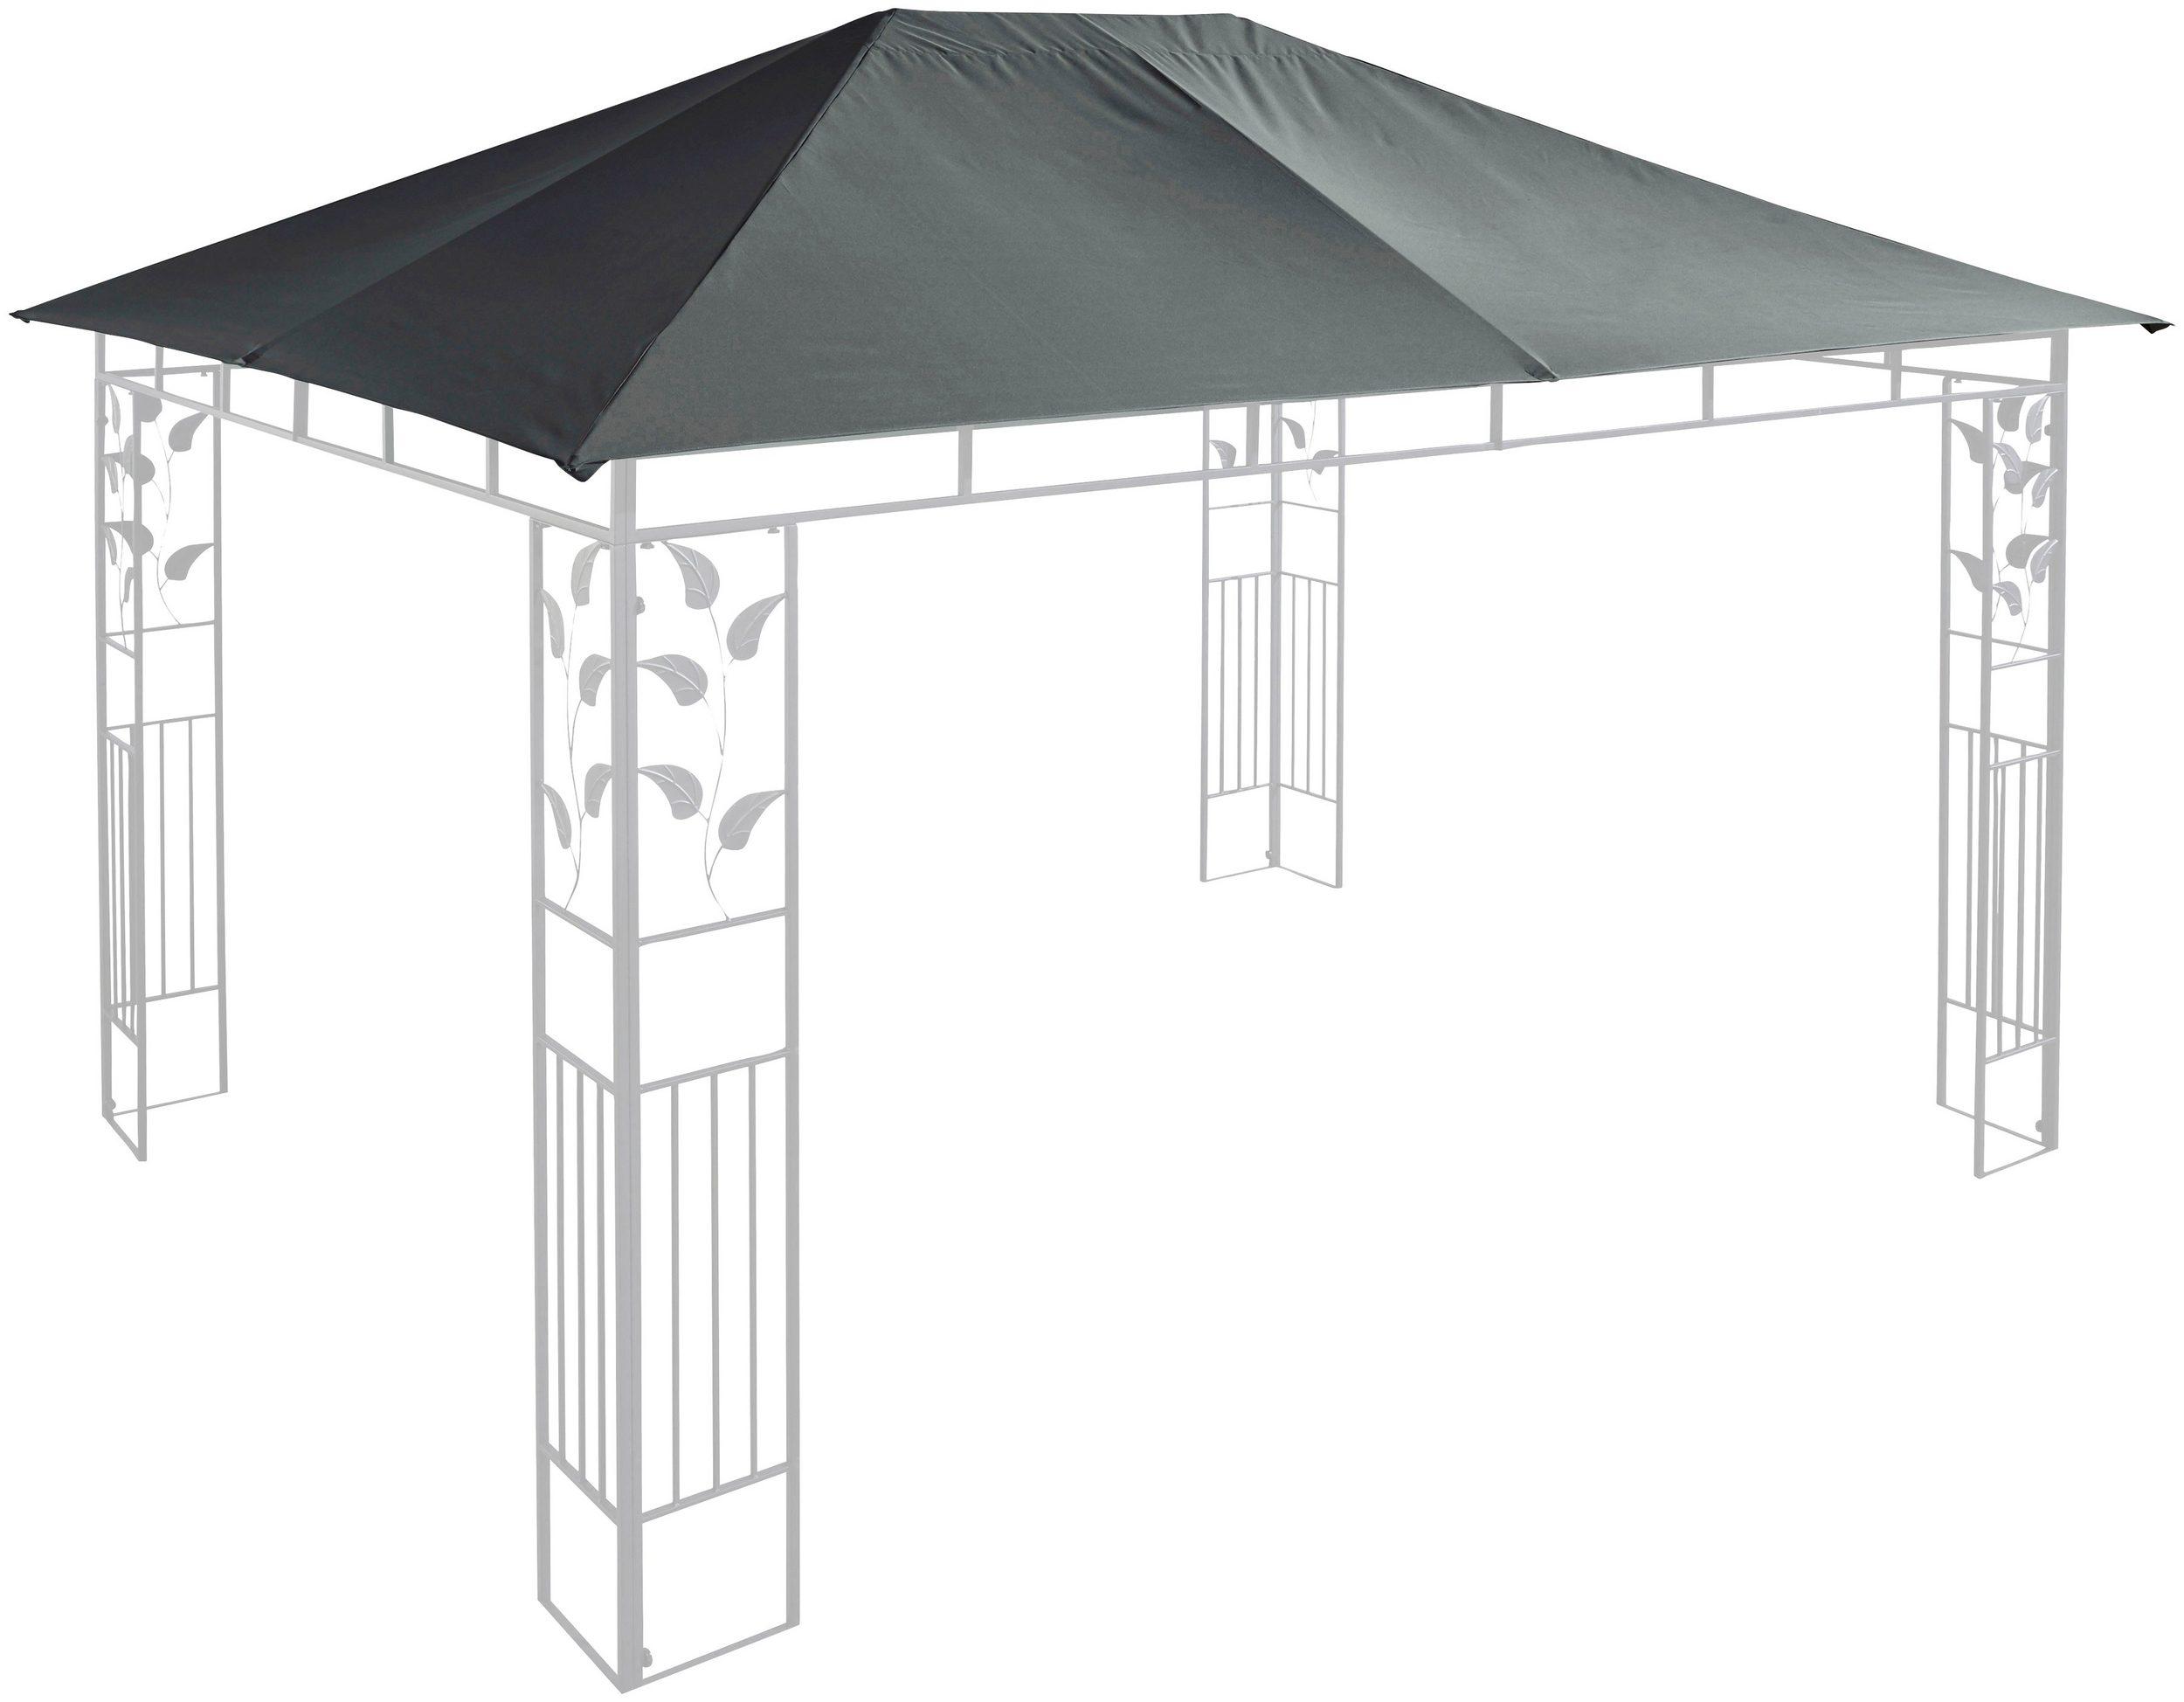 Ersatzdach Dach für  Pavillon 3 m anthrazit PU-Beschichtung 7220184